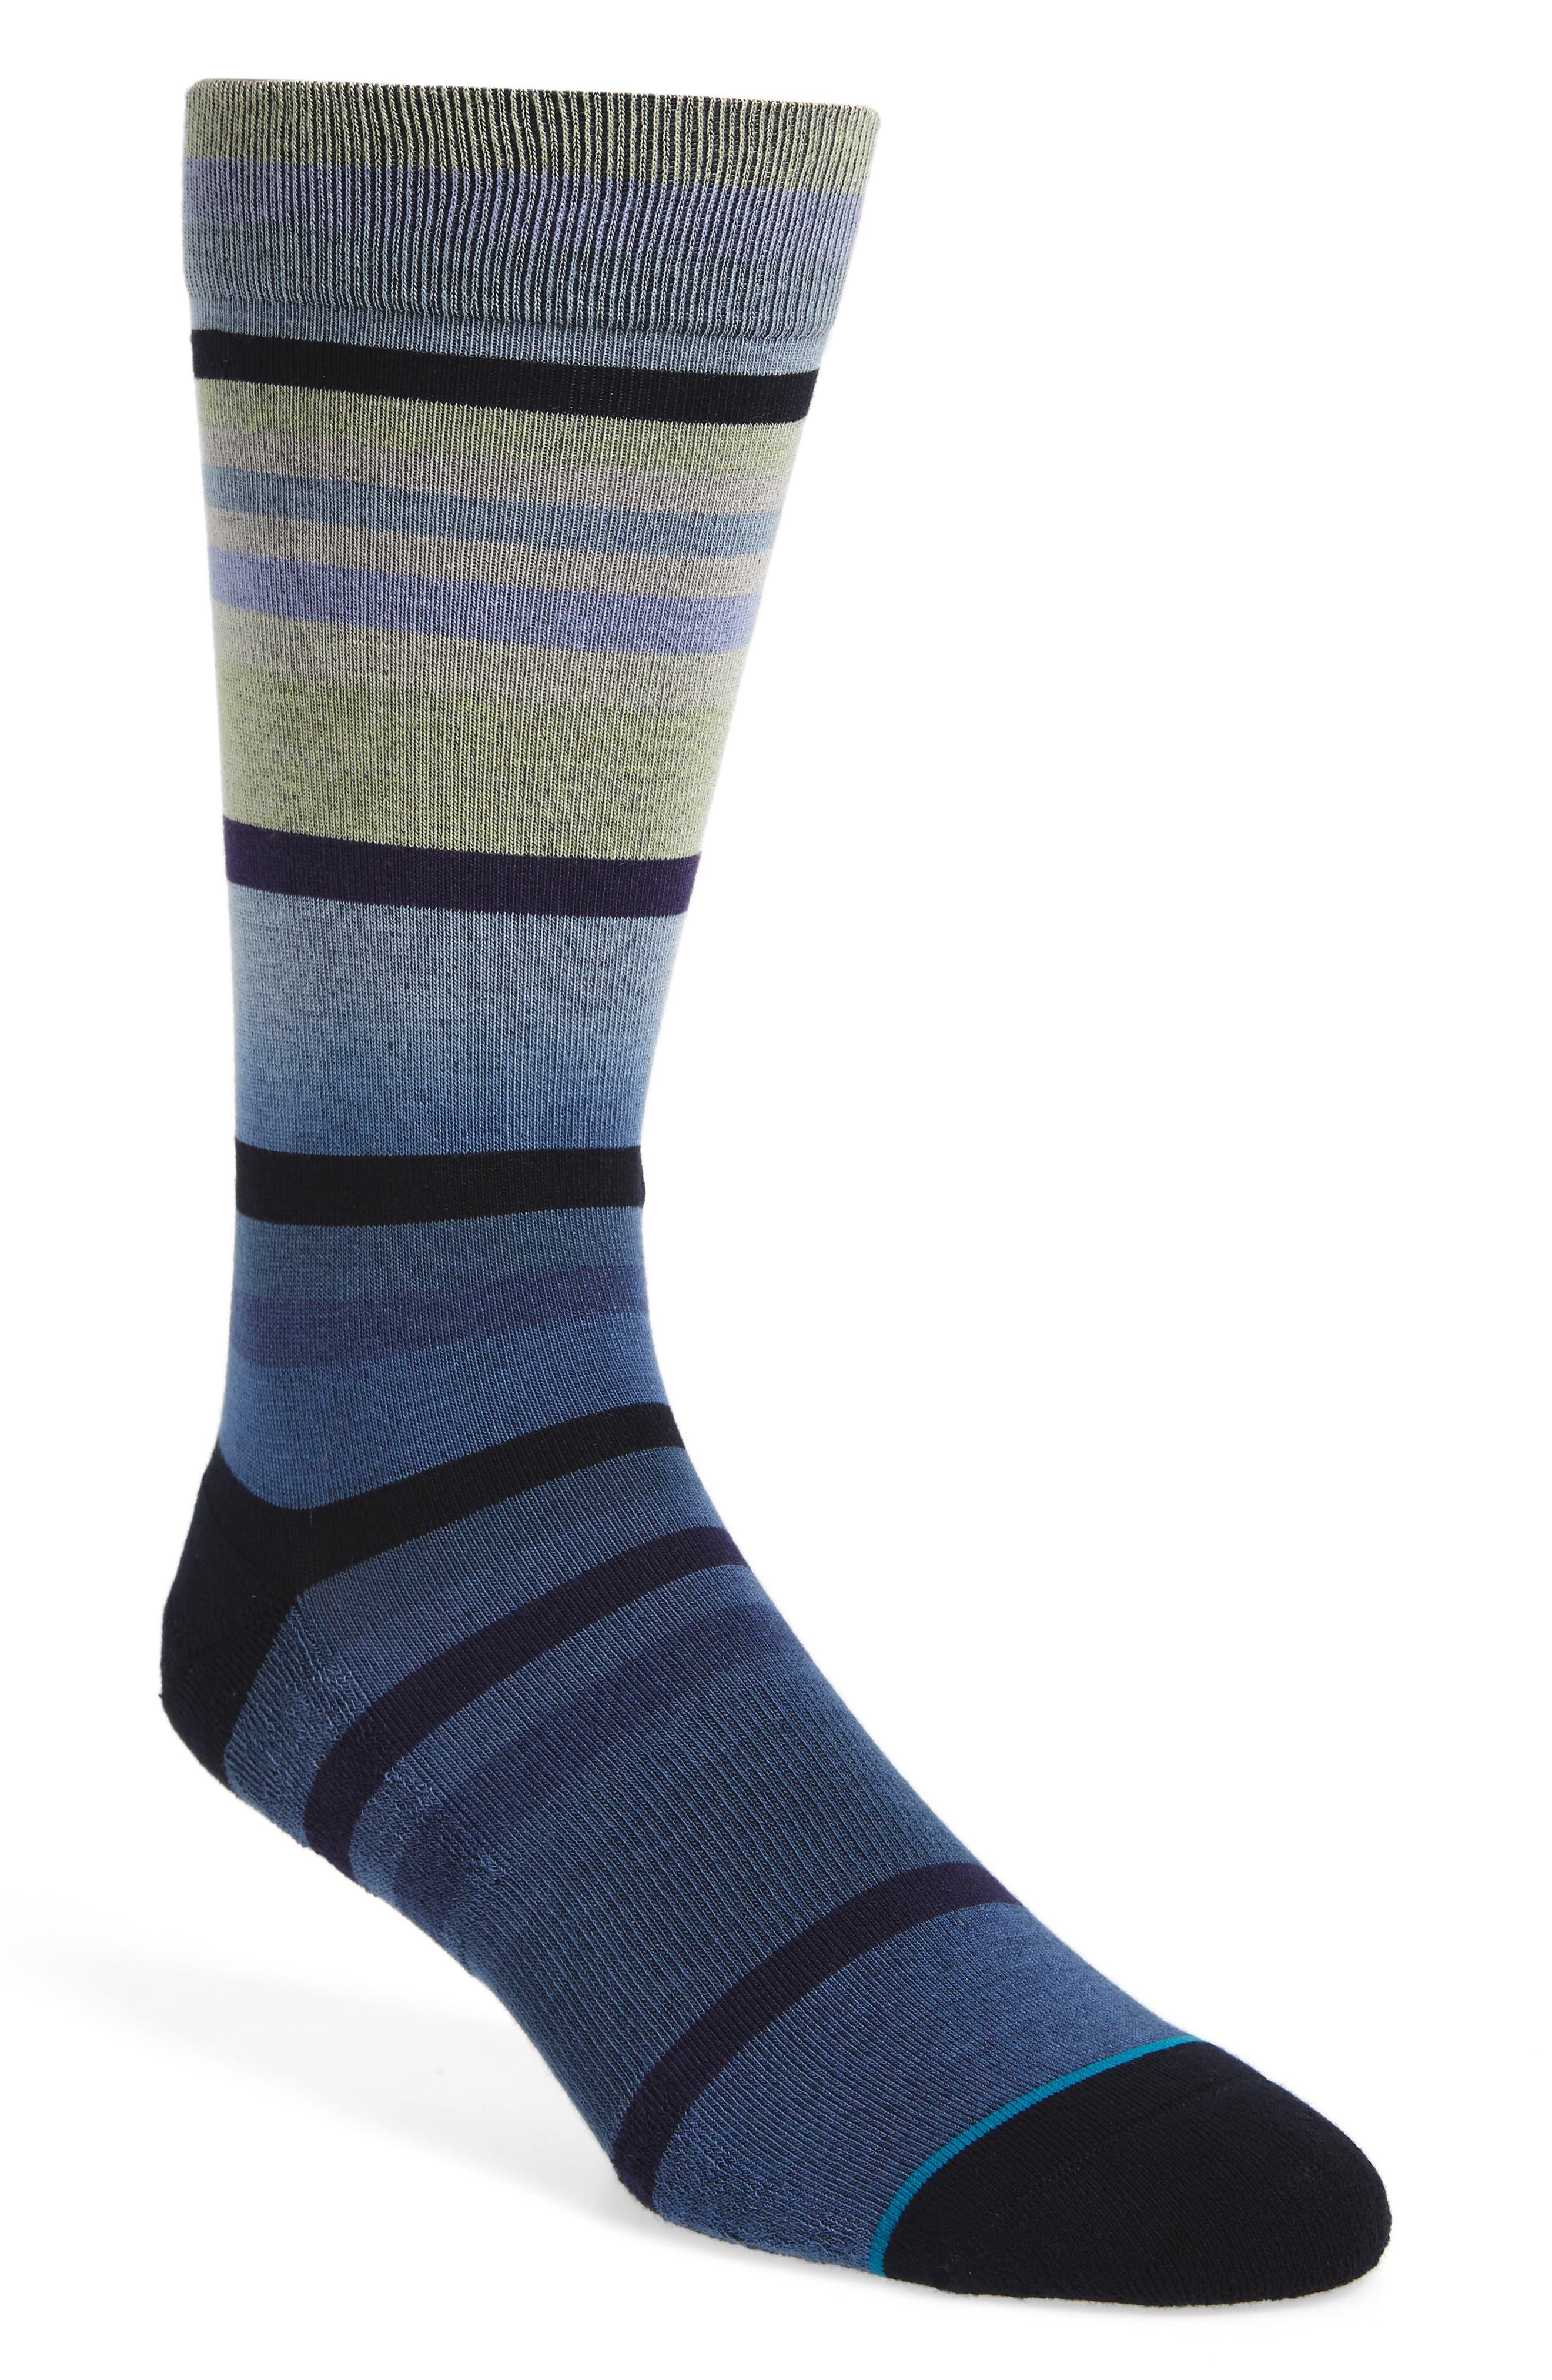 Main Image - Stance Reserve Worth Socks